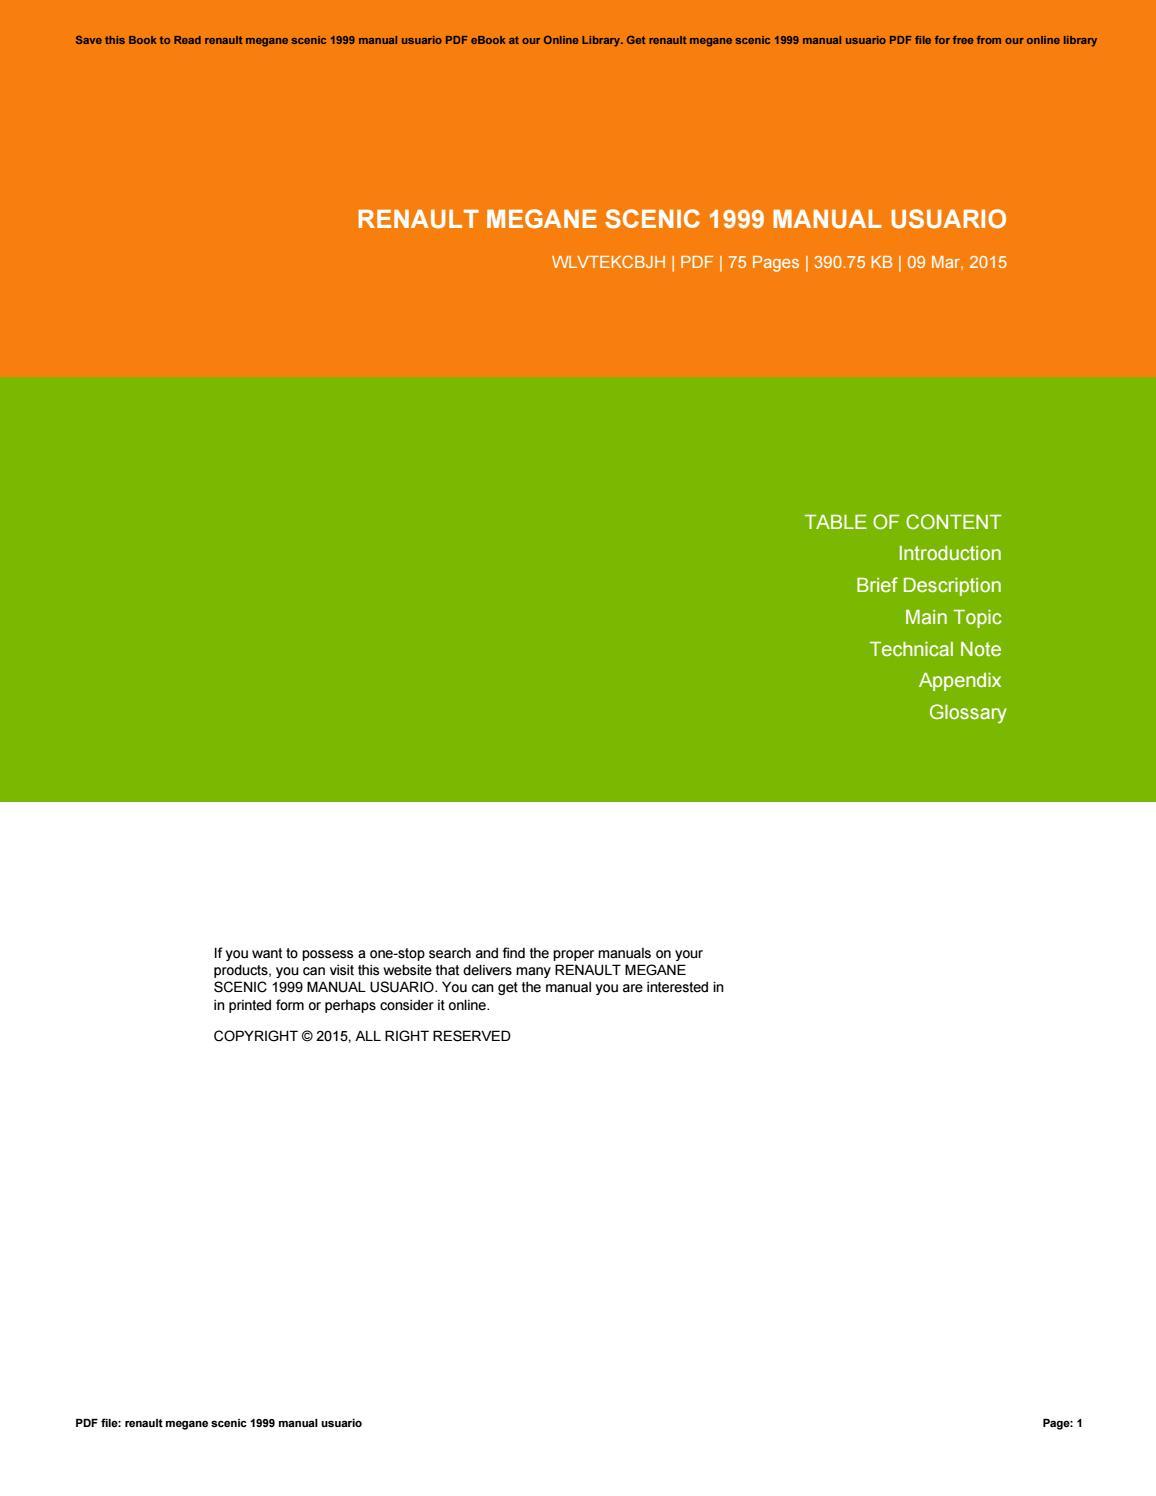 Manual Reanult Symbol Ebook Printed Circuit Board Assembly For Lg Wm2487hwma Washing Machine Array Renault Megane Alize Rh Bitlab Solu